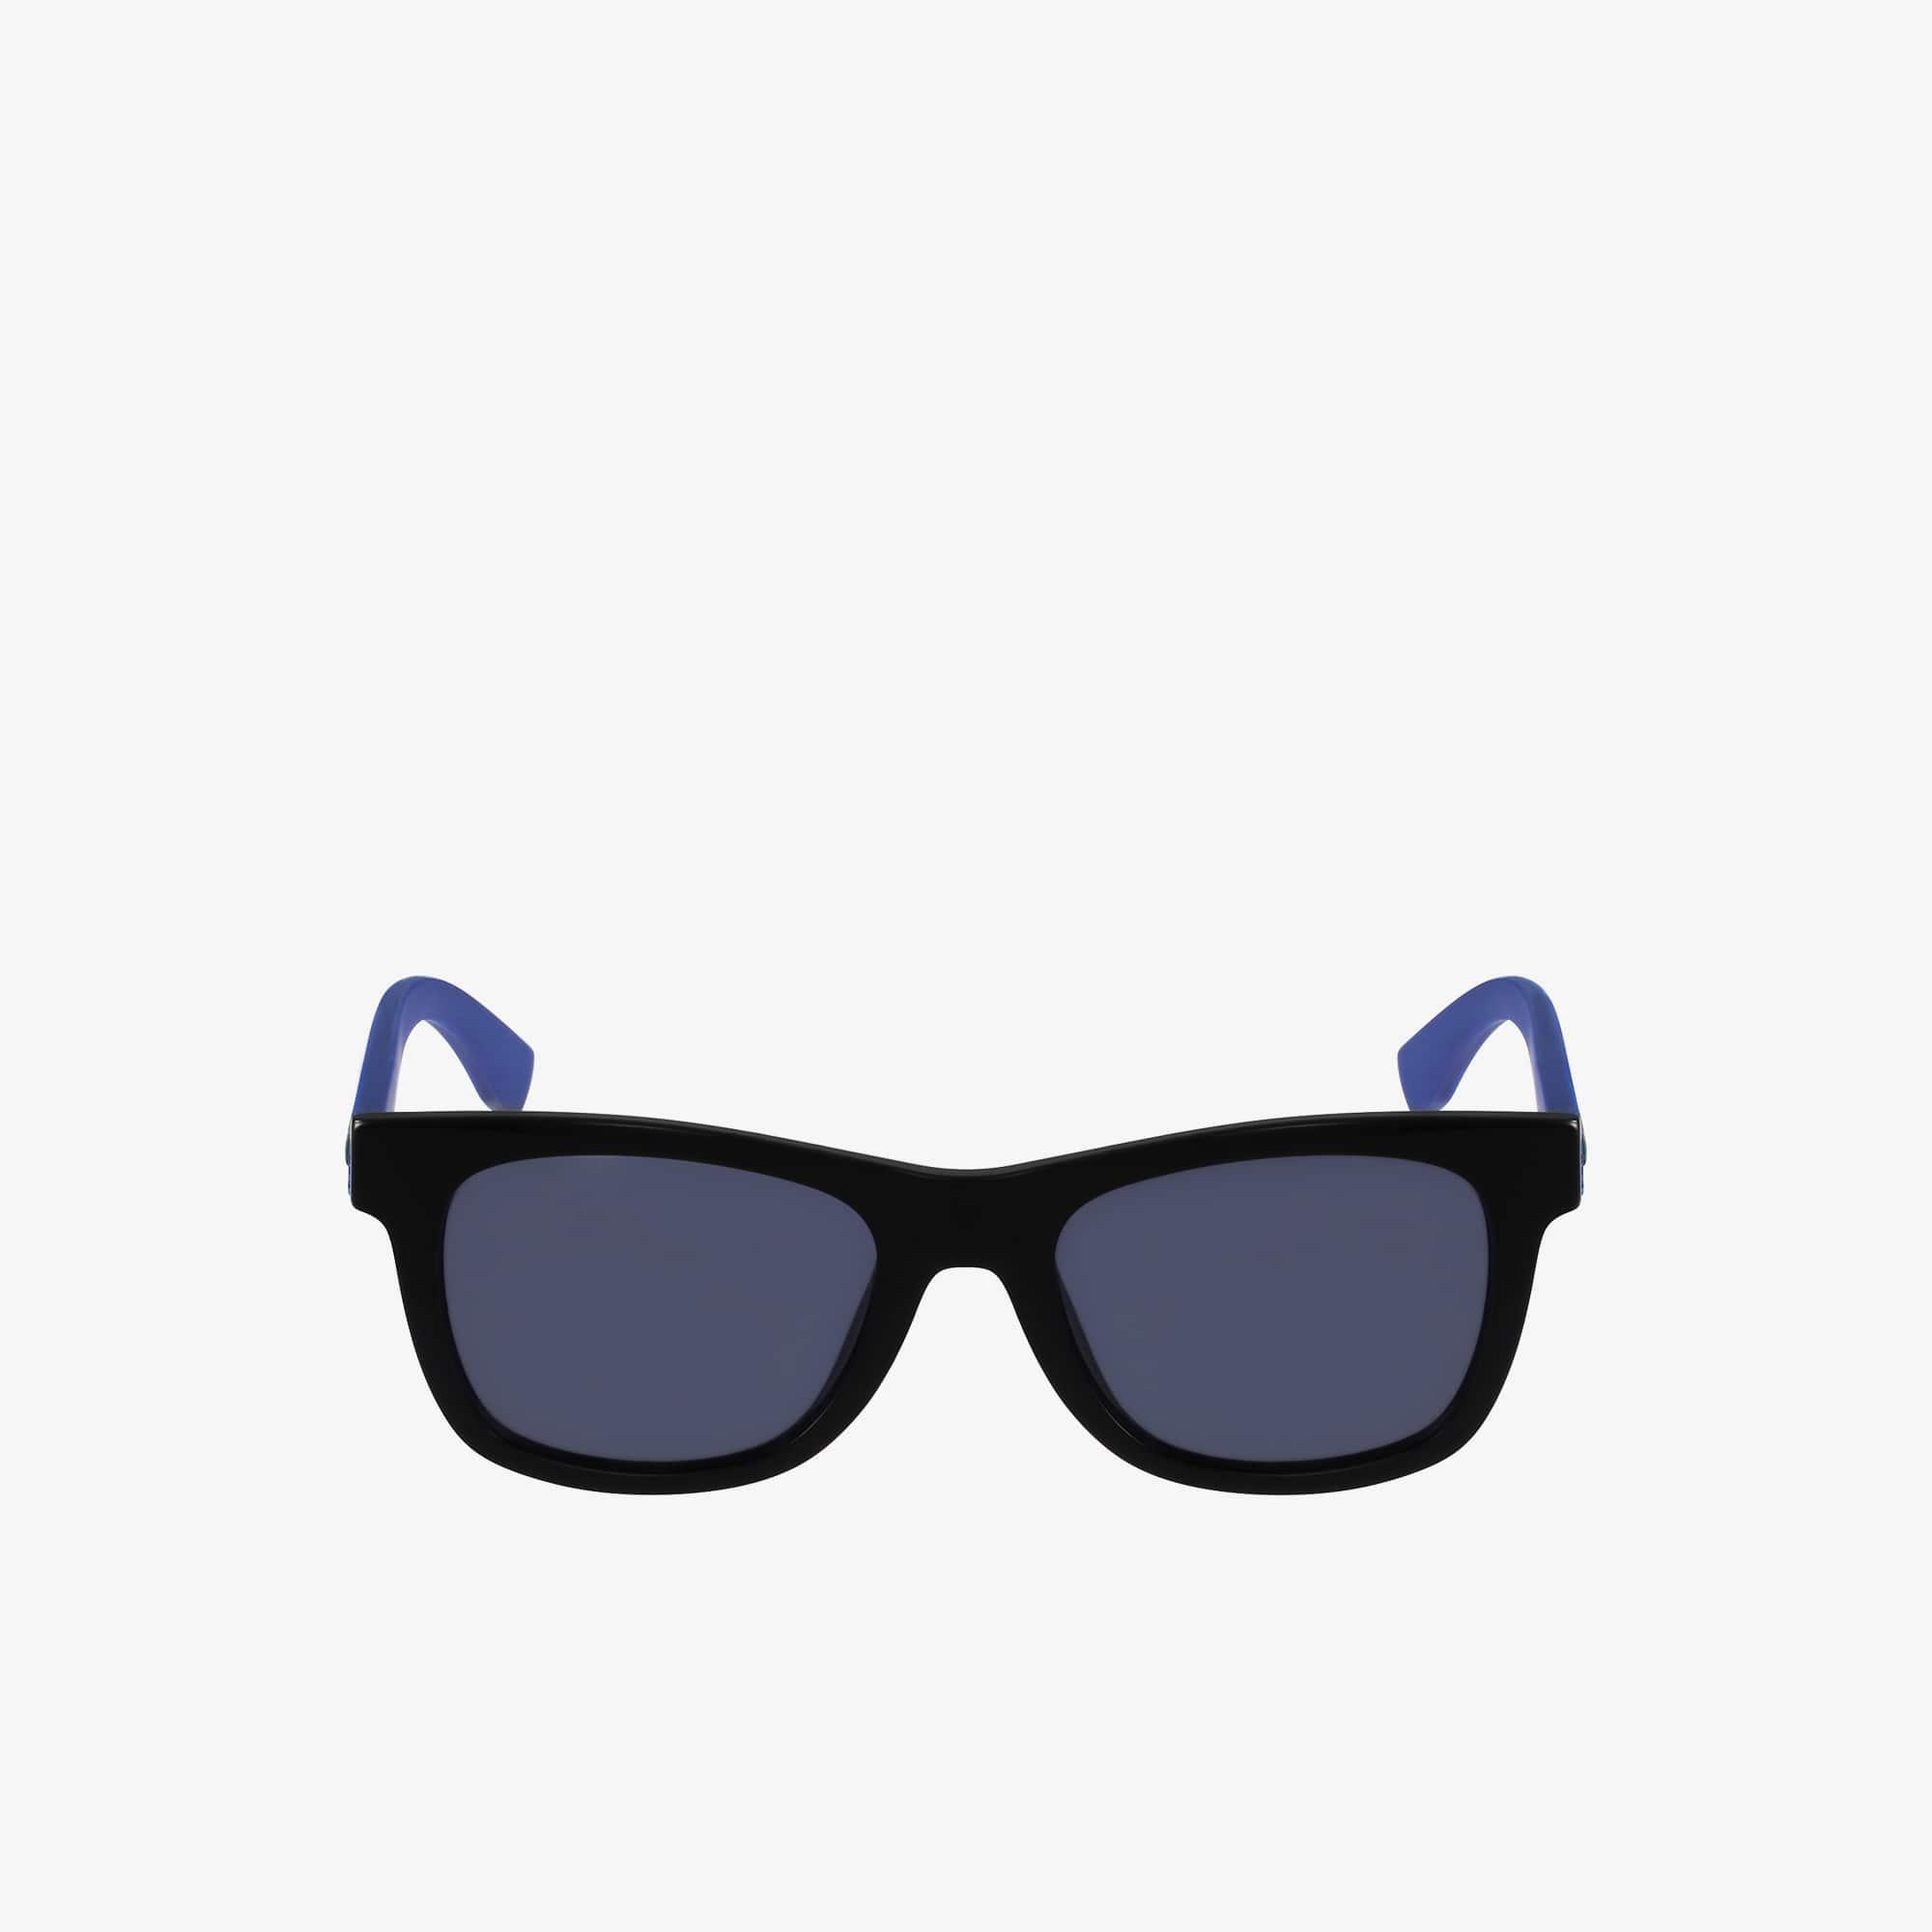 Kids' Rectangle Plastic L.12.12 Sunglasses